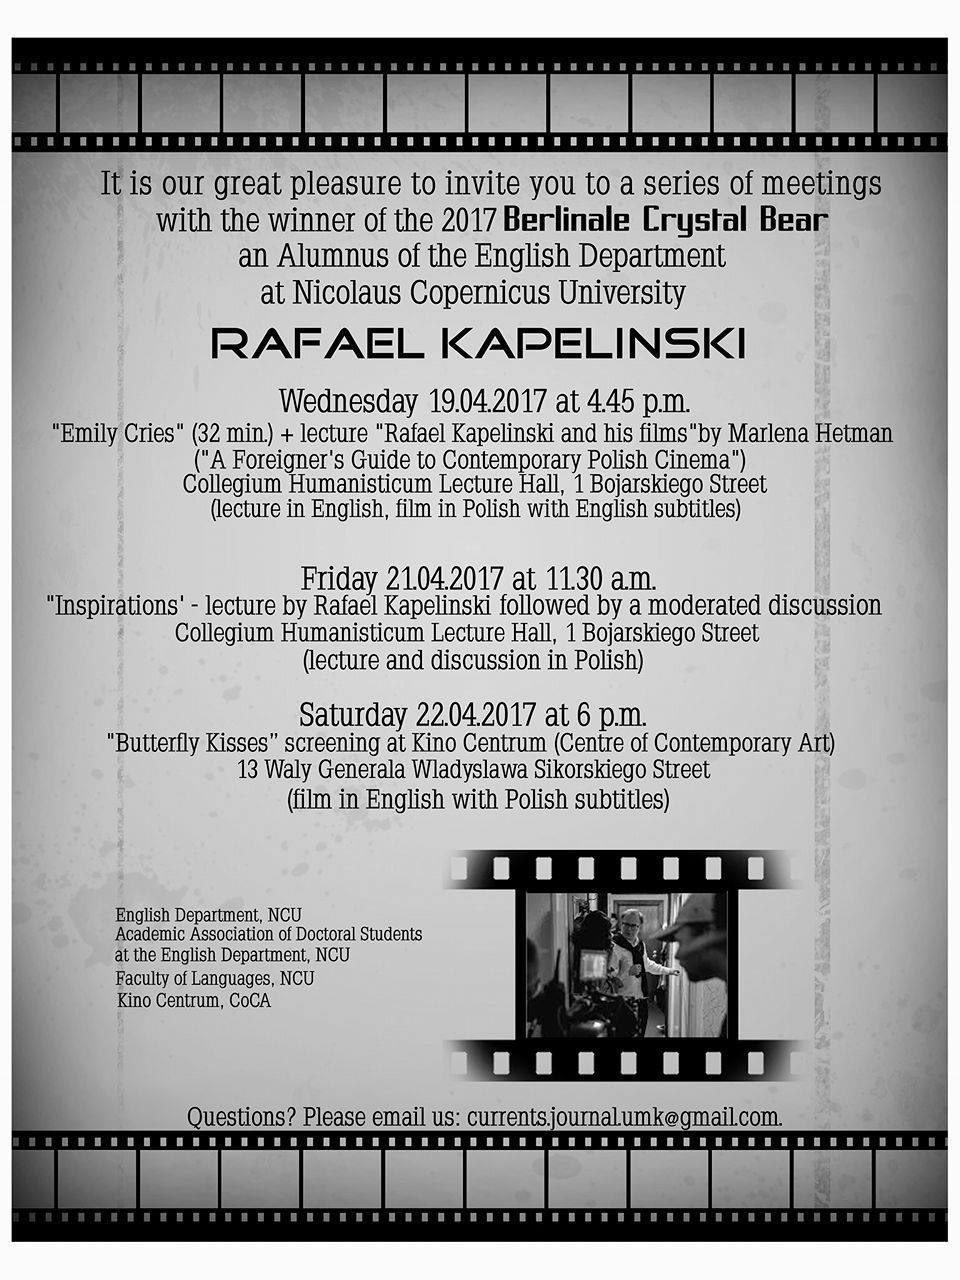 Rafael Kapelinski